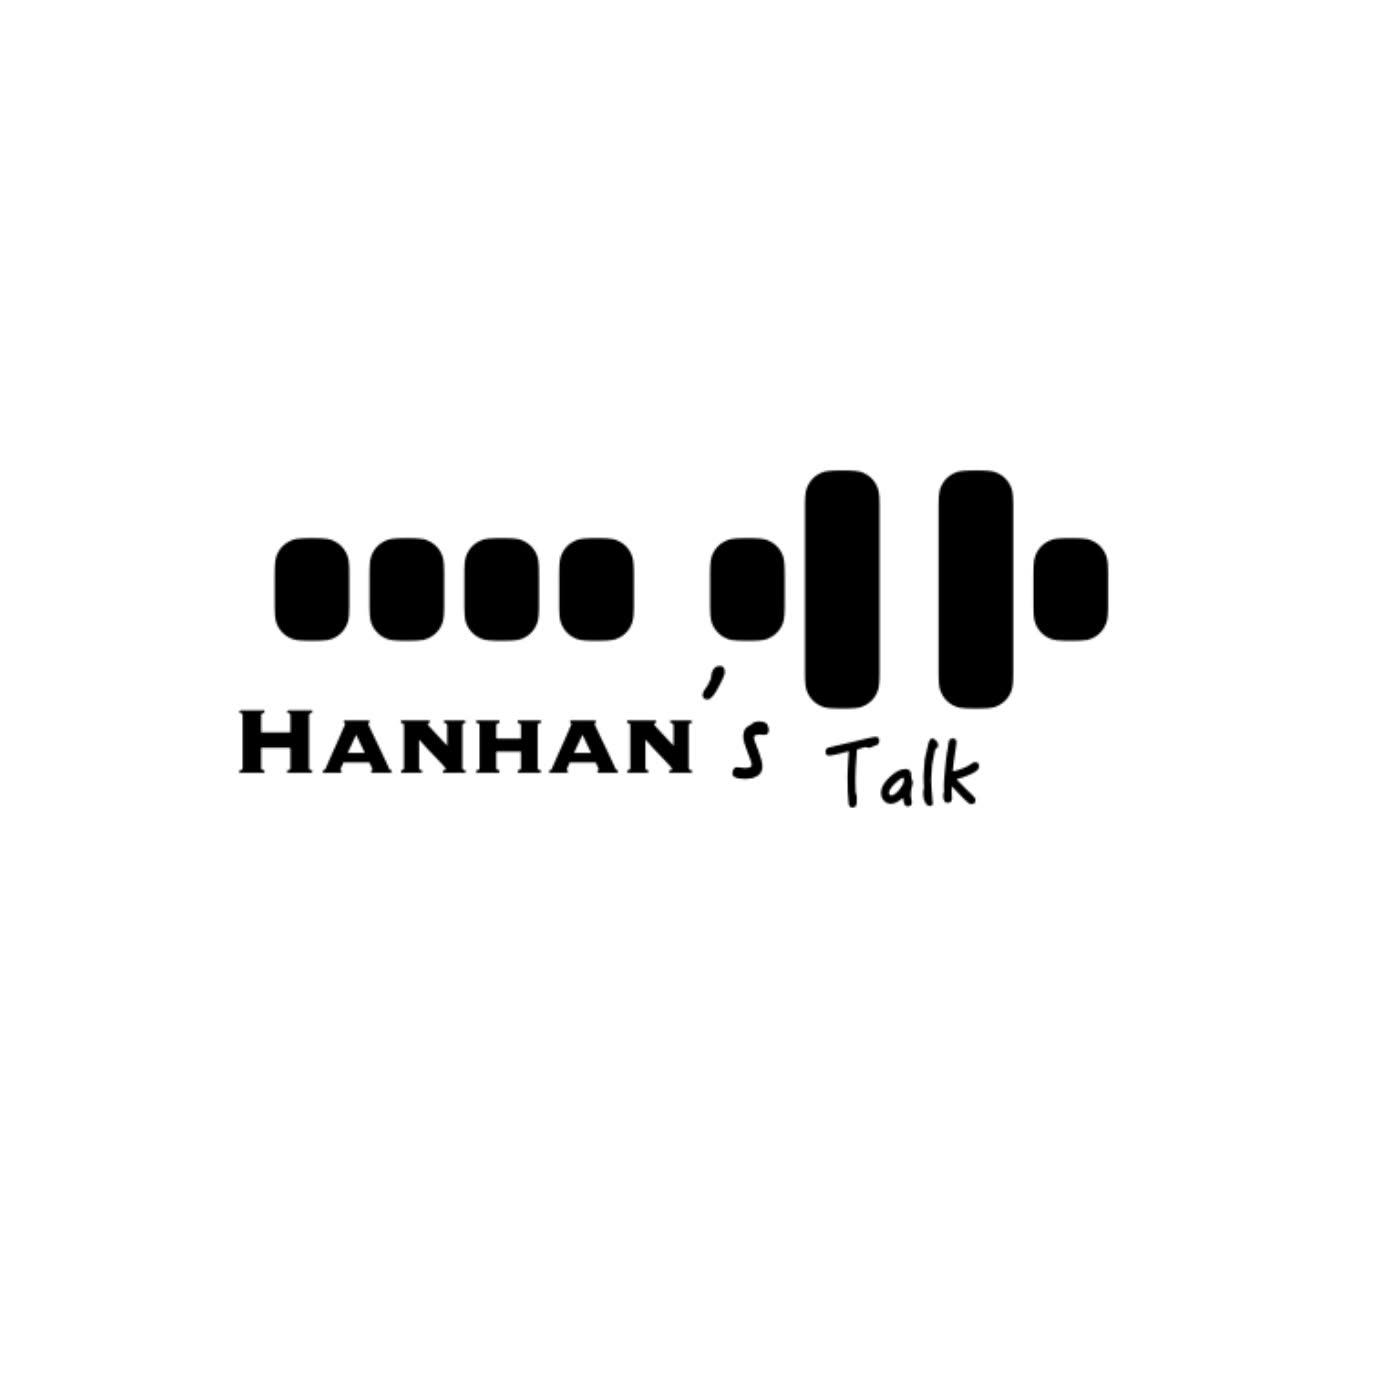 Hanhan's talk